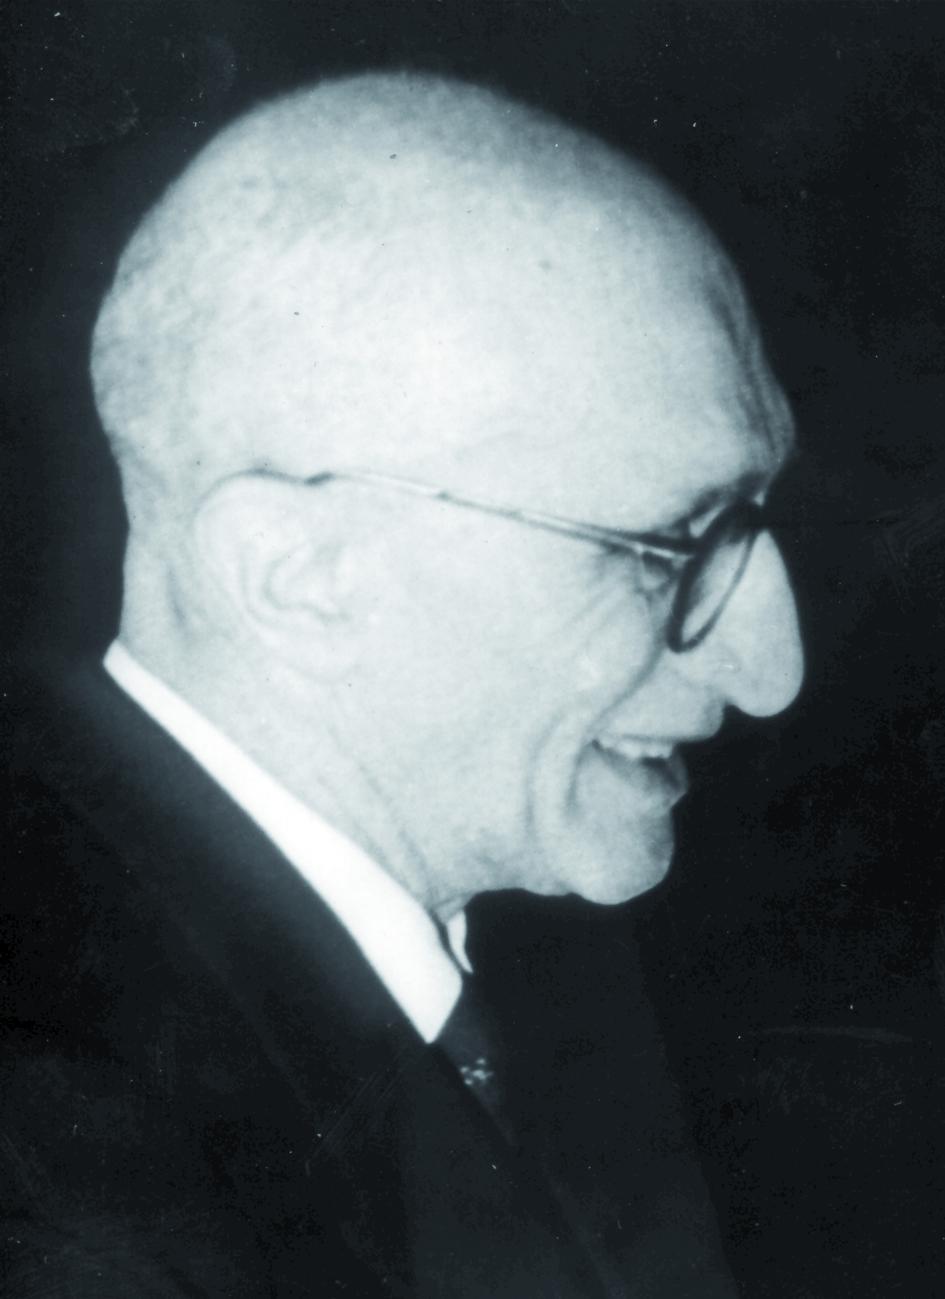 Portraitfoto von Herrn Gian Guiseppe Palmieri.